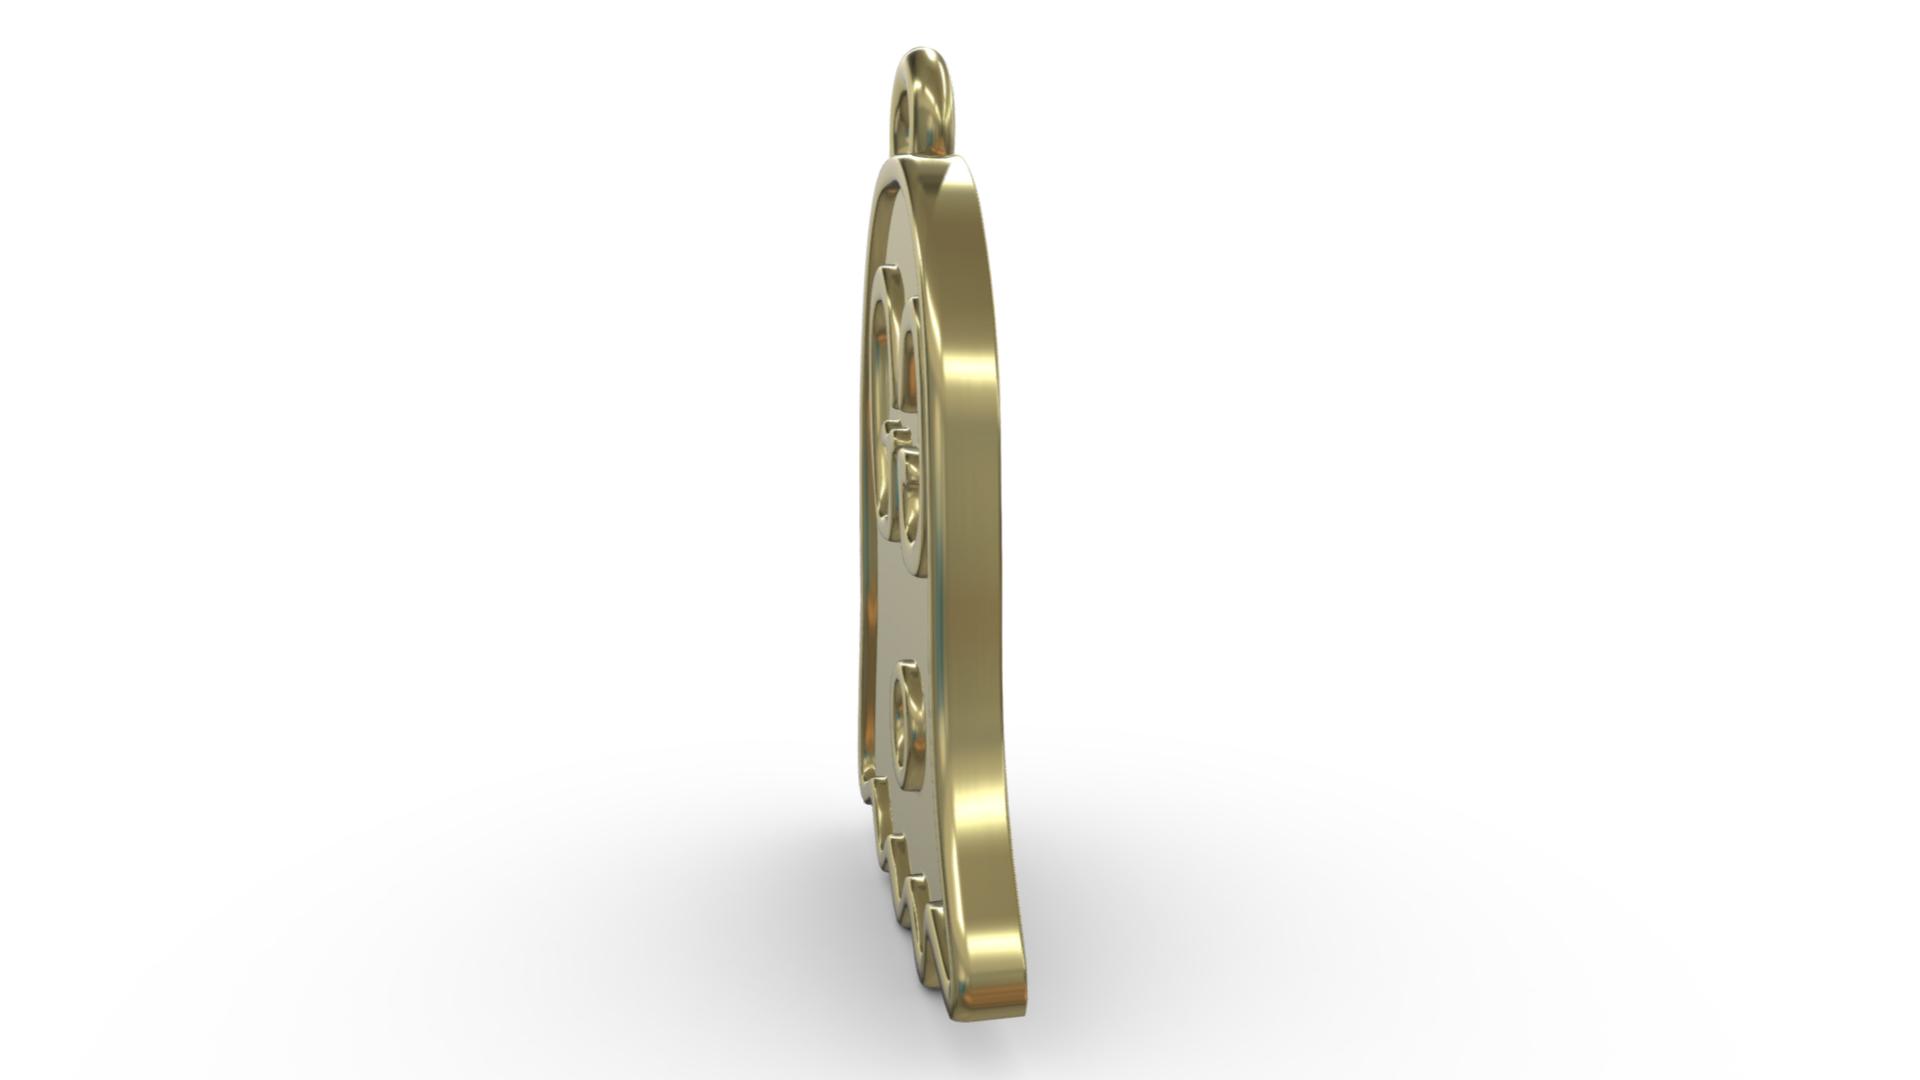 7a37195fc Gucci pendant 2 - 3DOcean Item for Sale. 1.jpg 10.jpg 2.jpg 3.jpg ...